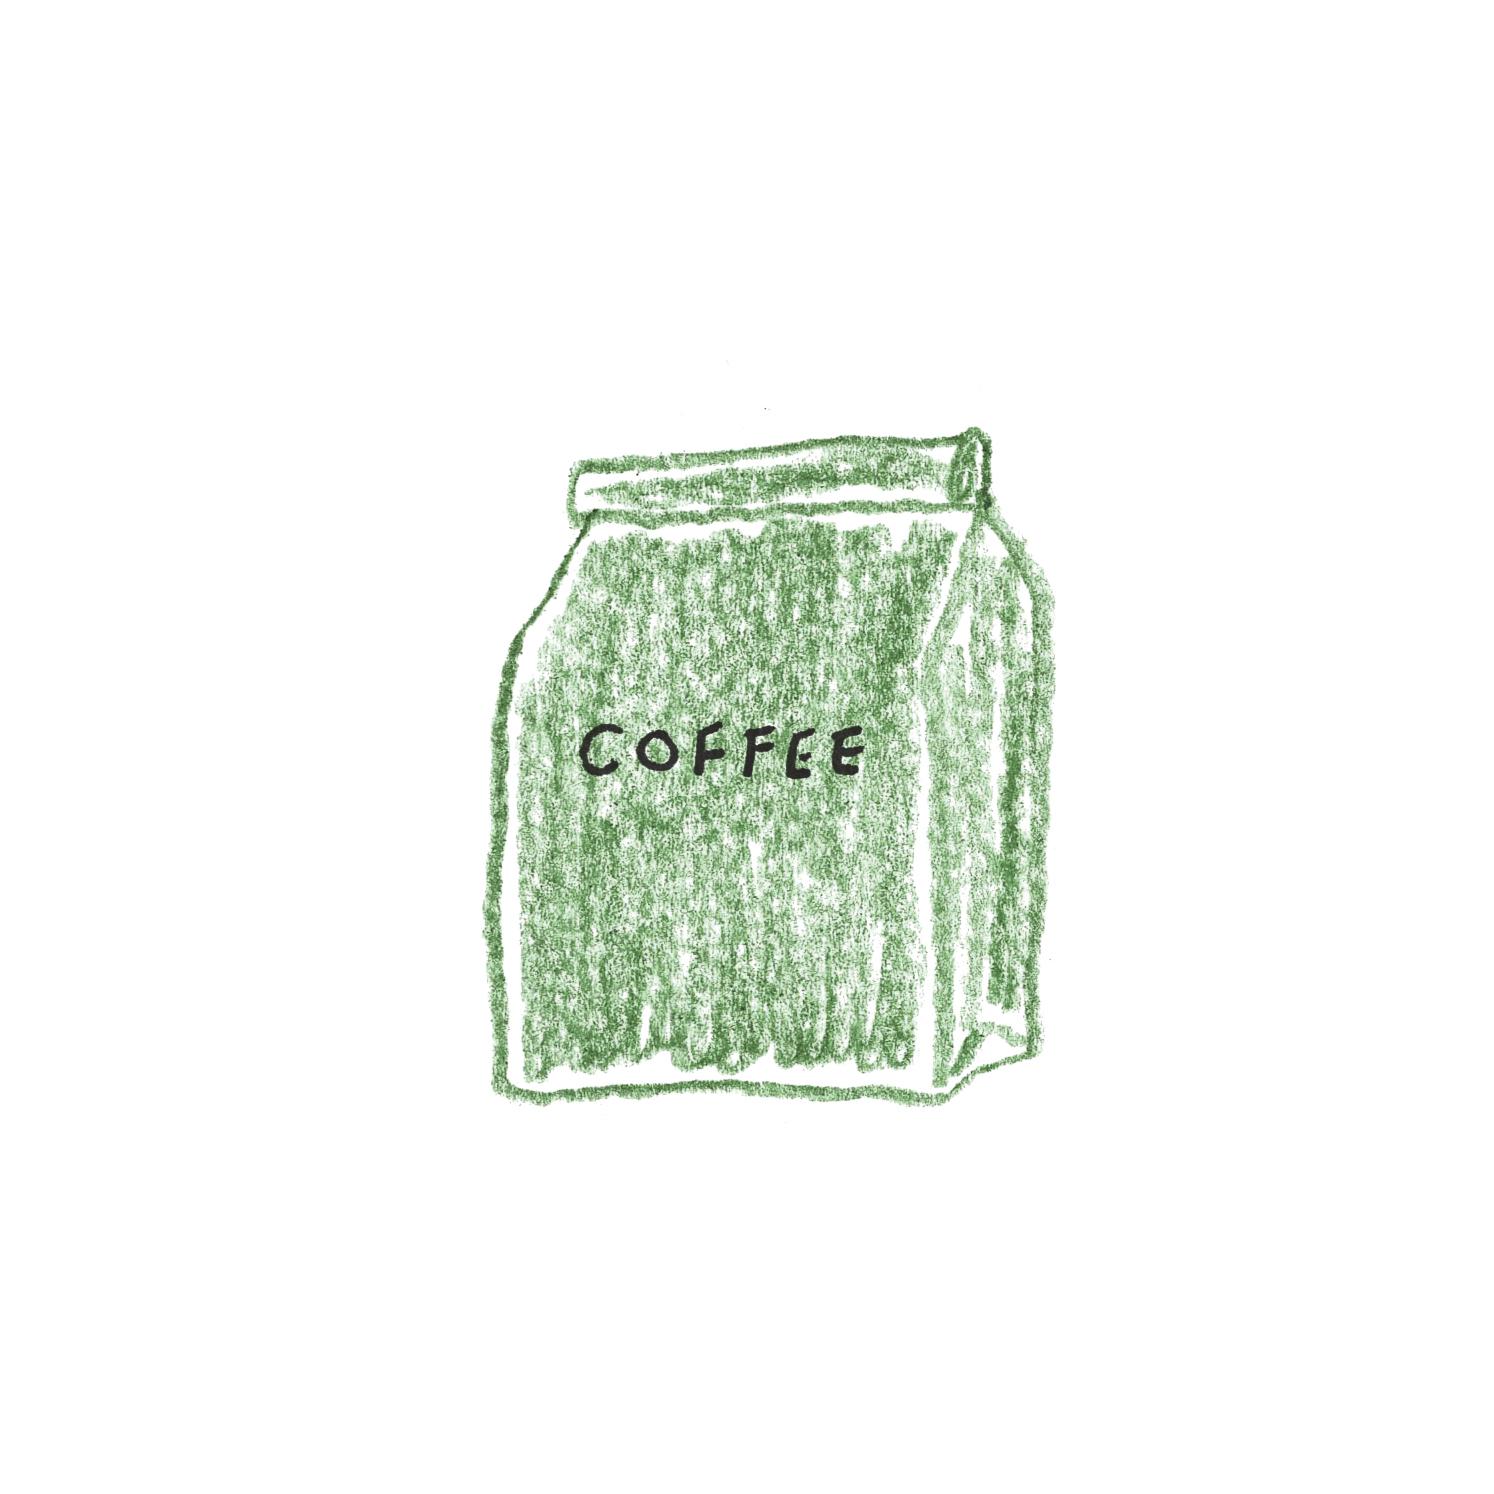 B:コーヒー豆や茶葉